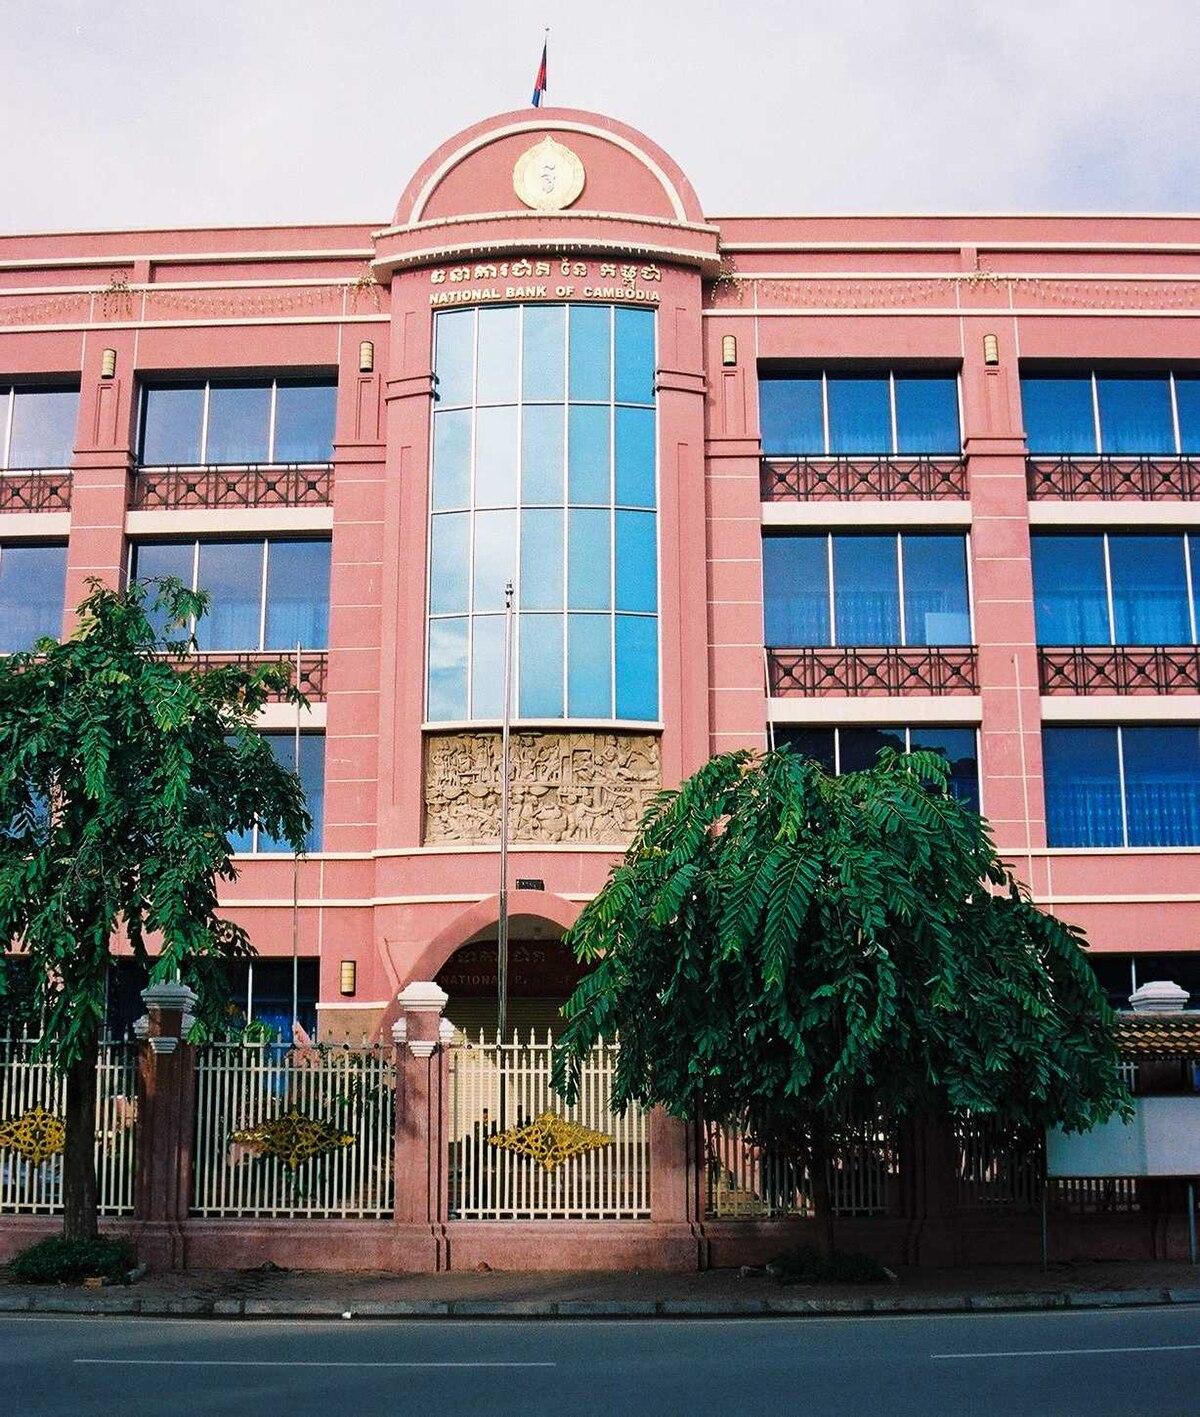 Cambodia: National Bank Of Cambodia